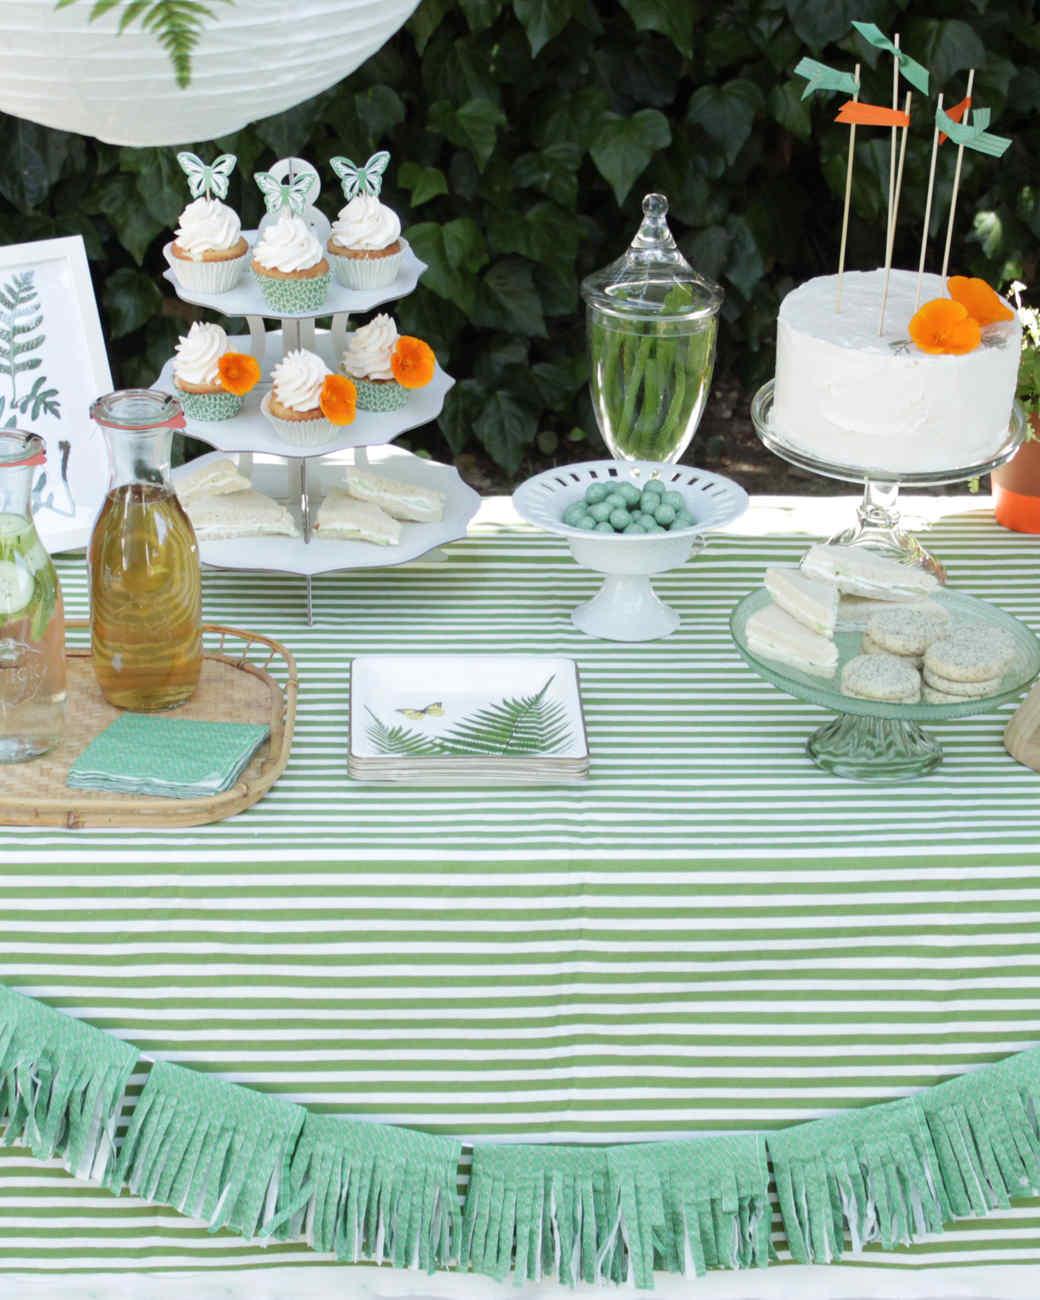 cake-blogger-pinparty.jpg